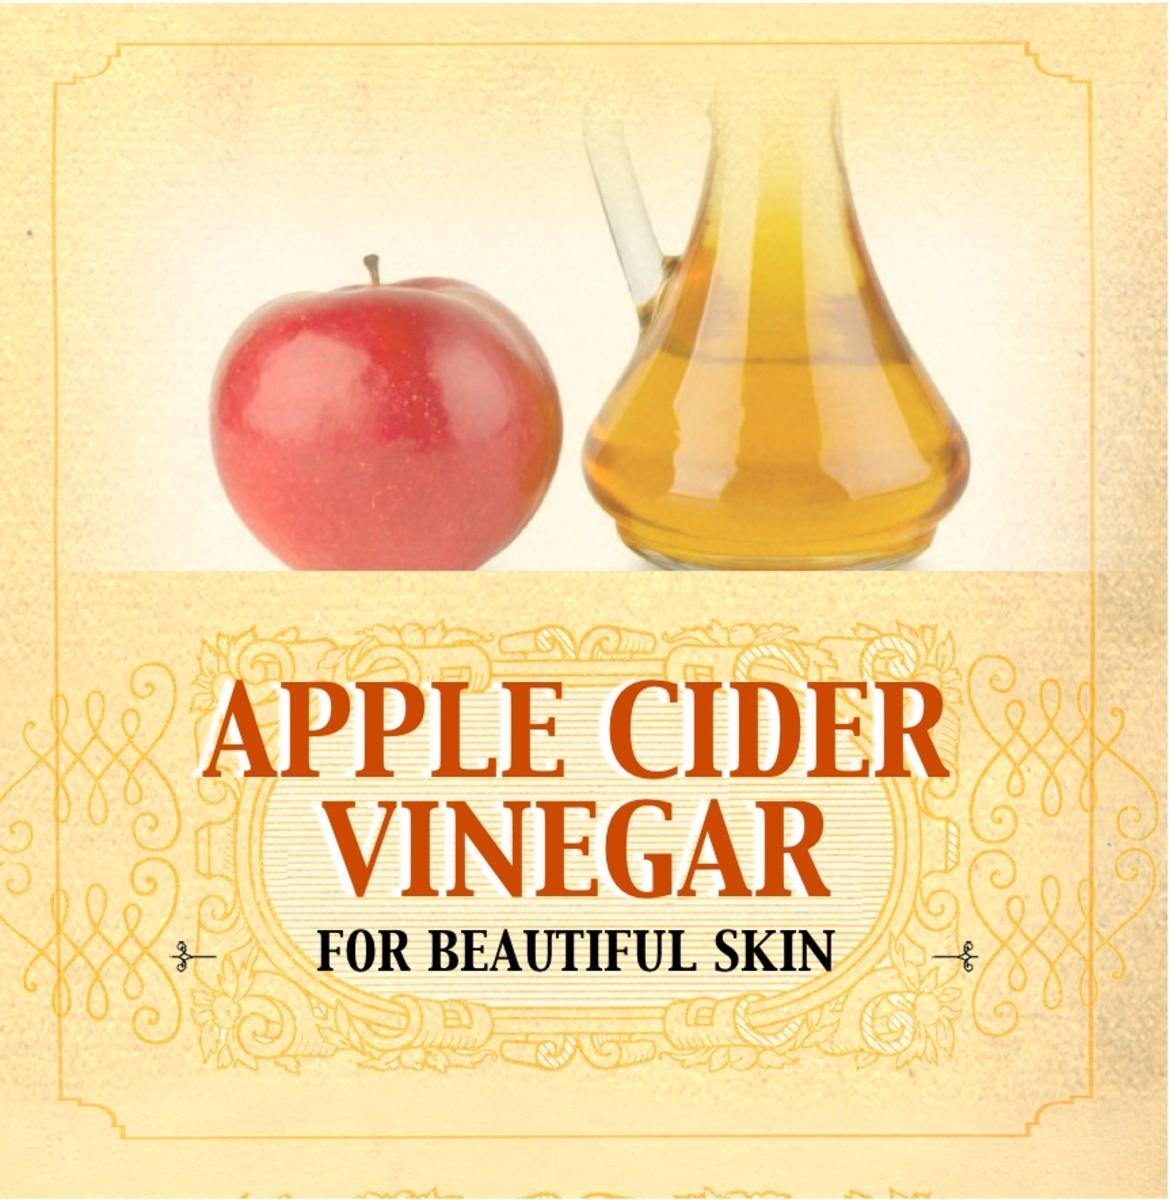 beautiful-skin-with-apple-cider-vinegar